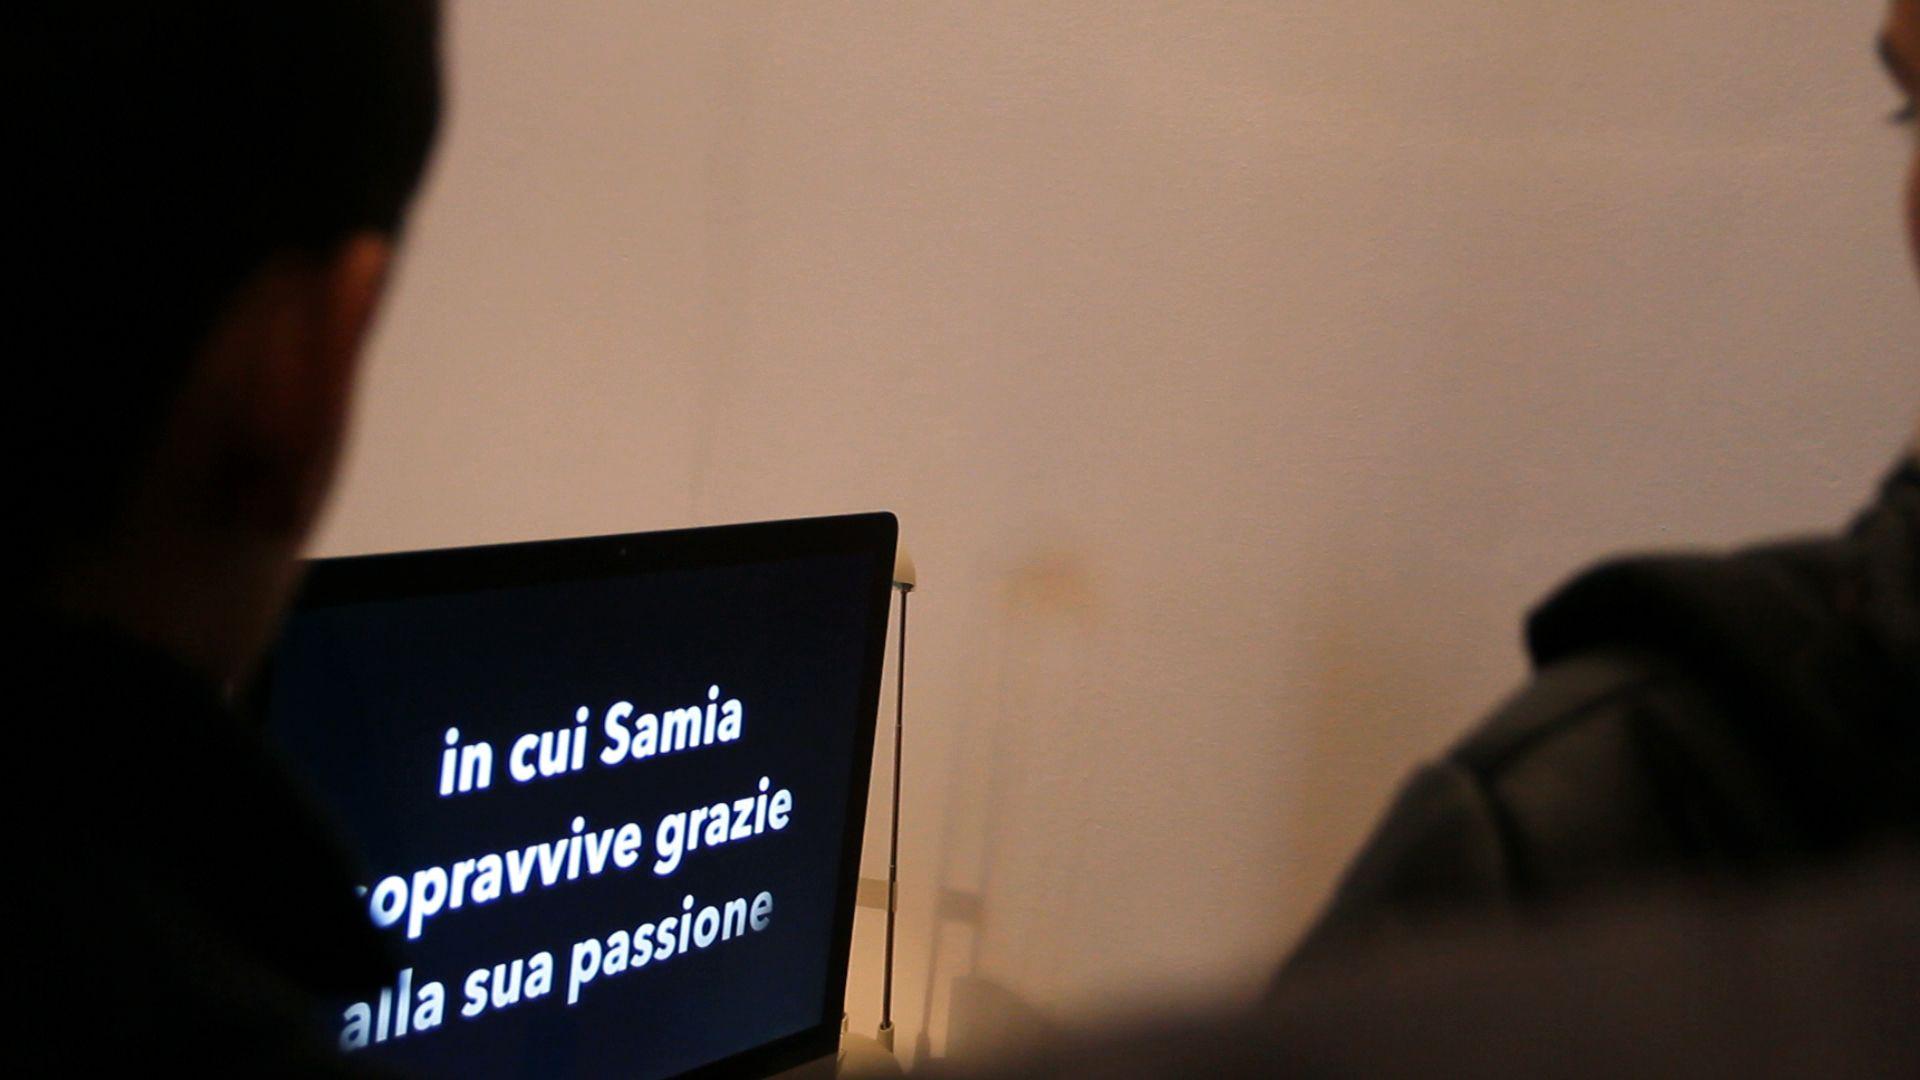 Ufficio Marketing. Visita casa editrice Feltrinelli.